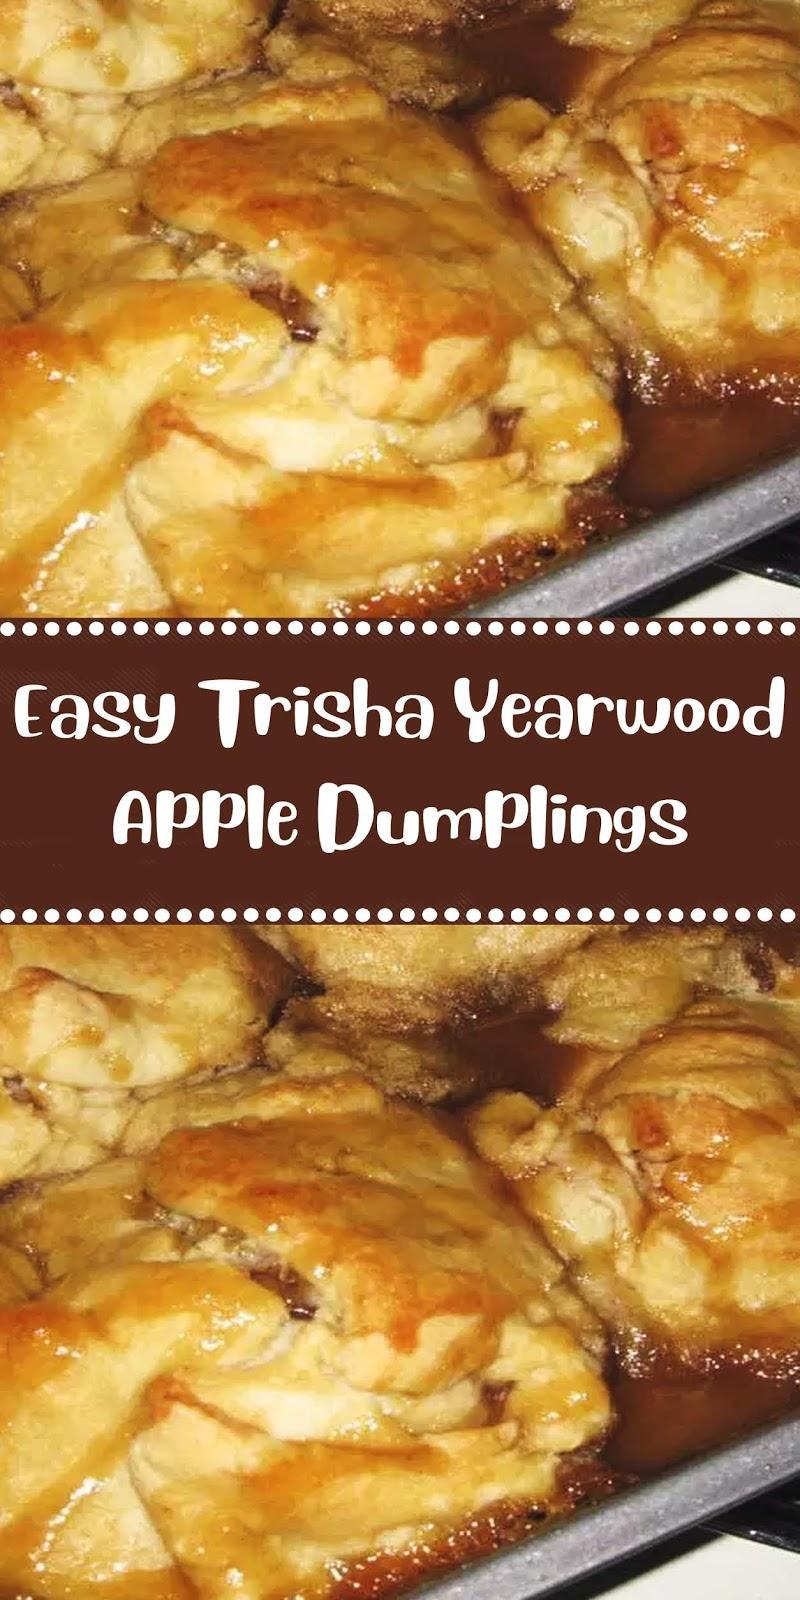 Easy Trisha Yearwood Apple Dumplings Dapur Simbah Apple Dumplings Easy Thanksgiving Recipes Trisha Yearwood Recipes